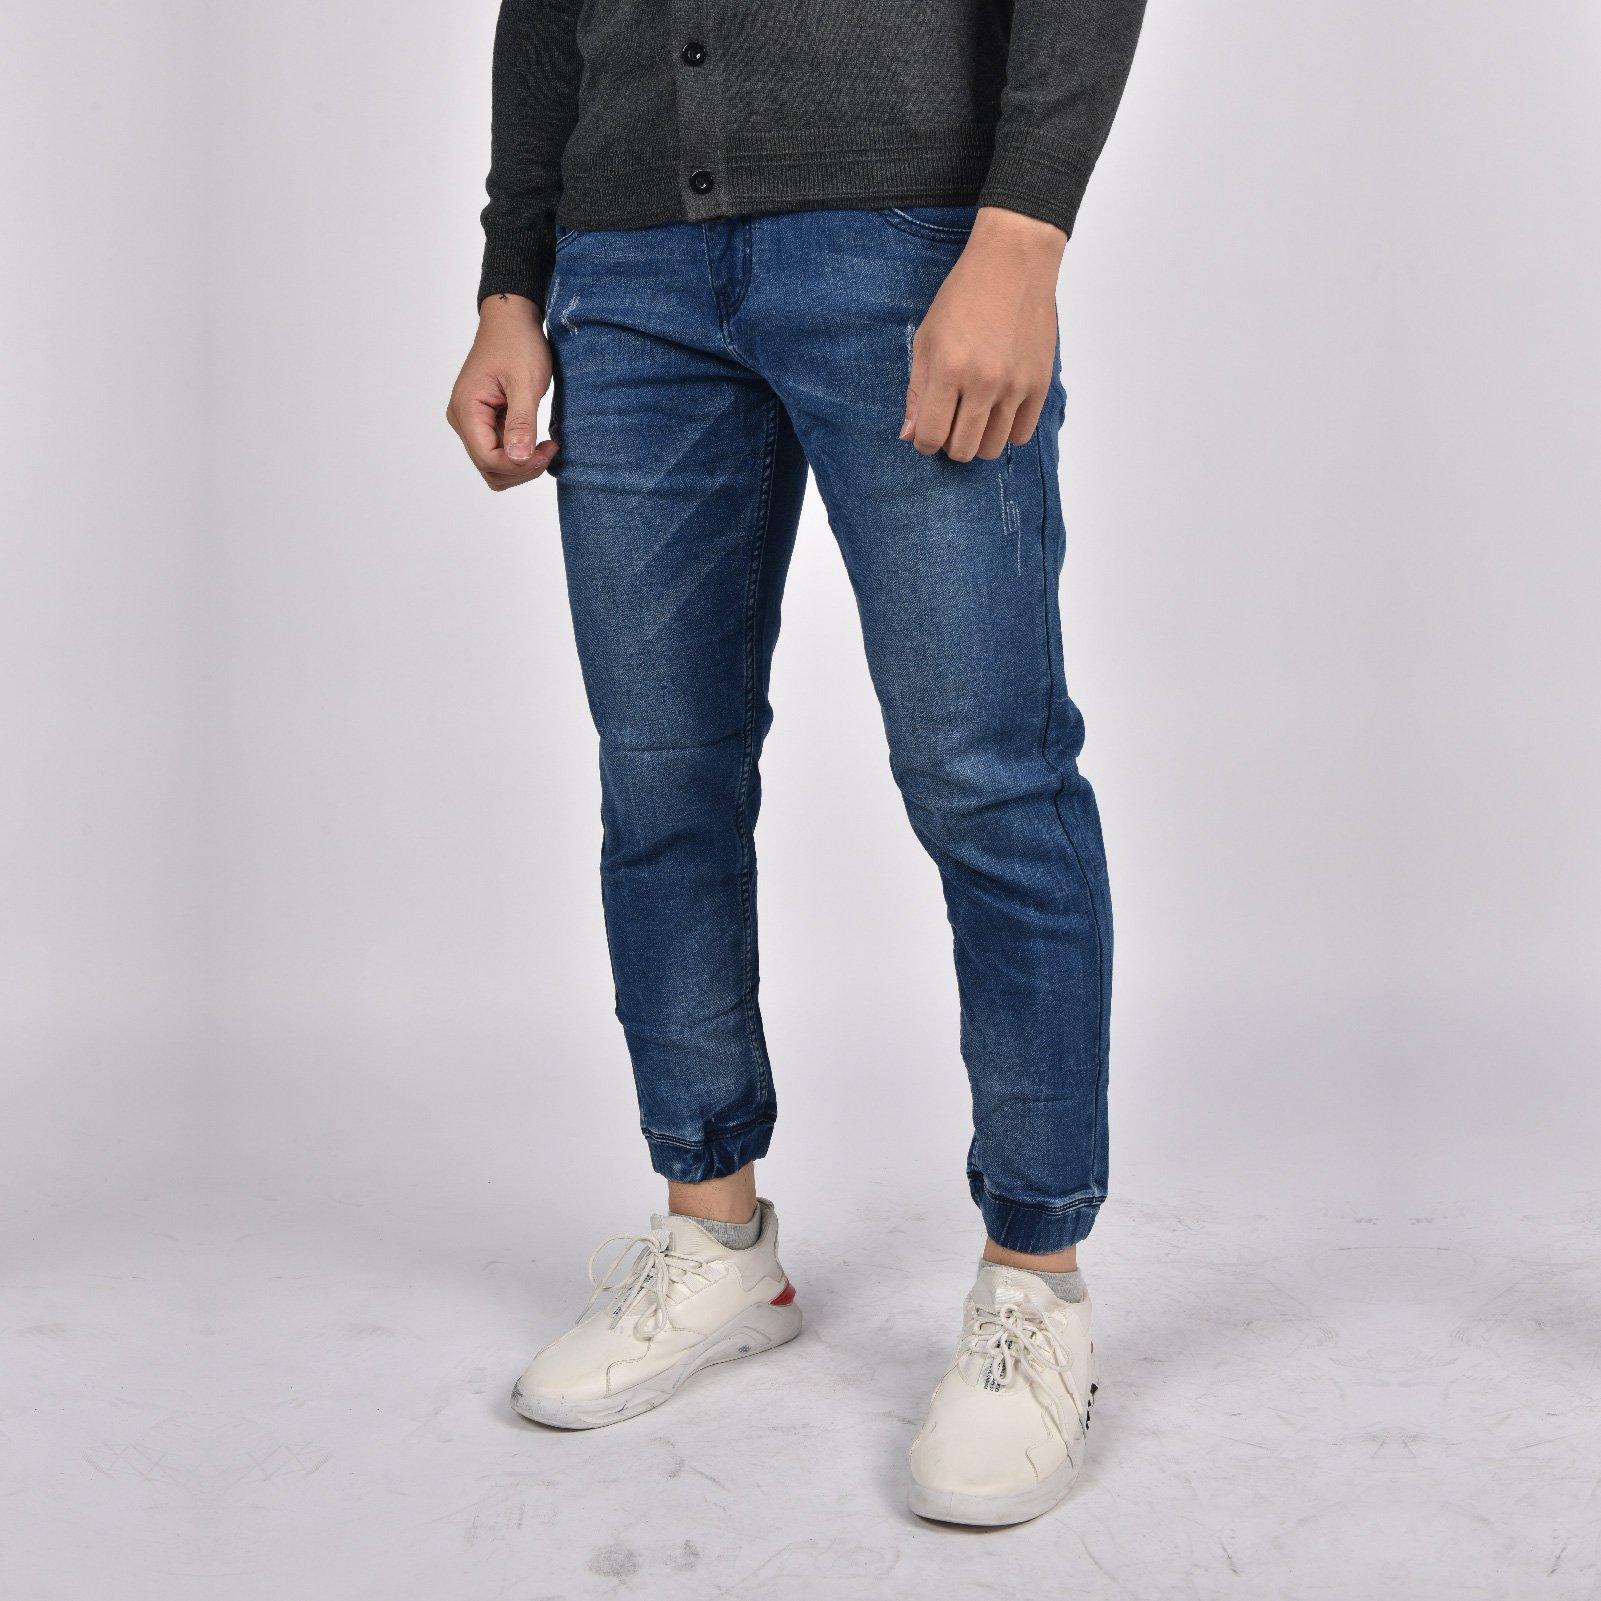 Quần Jean Skinny Dài Nam O.jeans - QJD50002FM